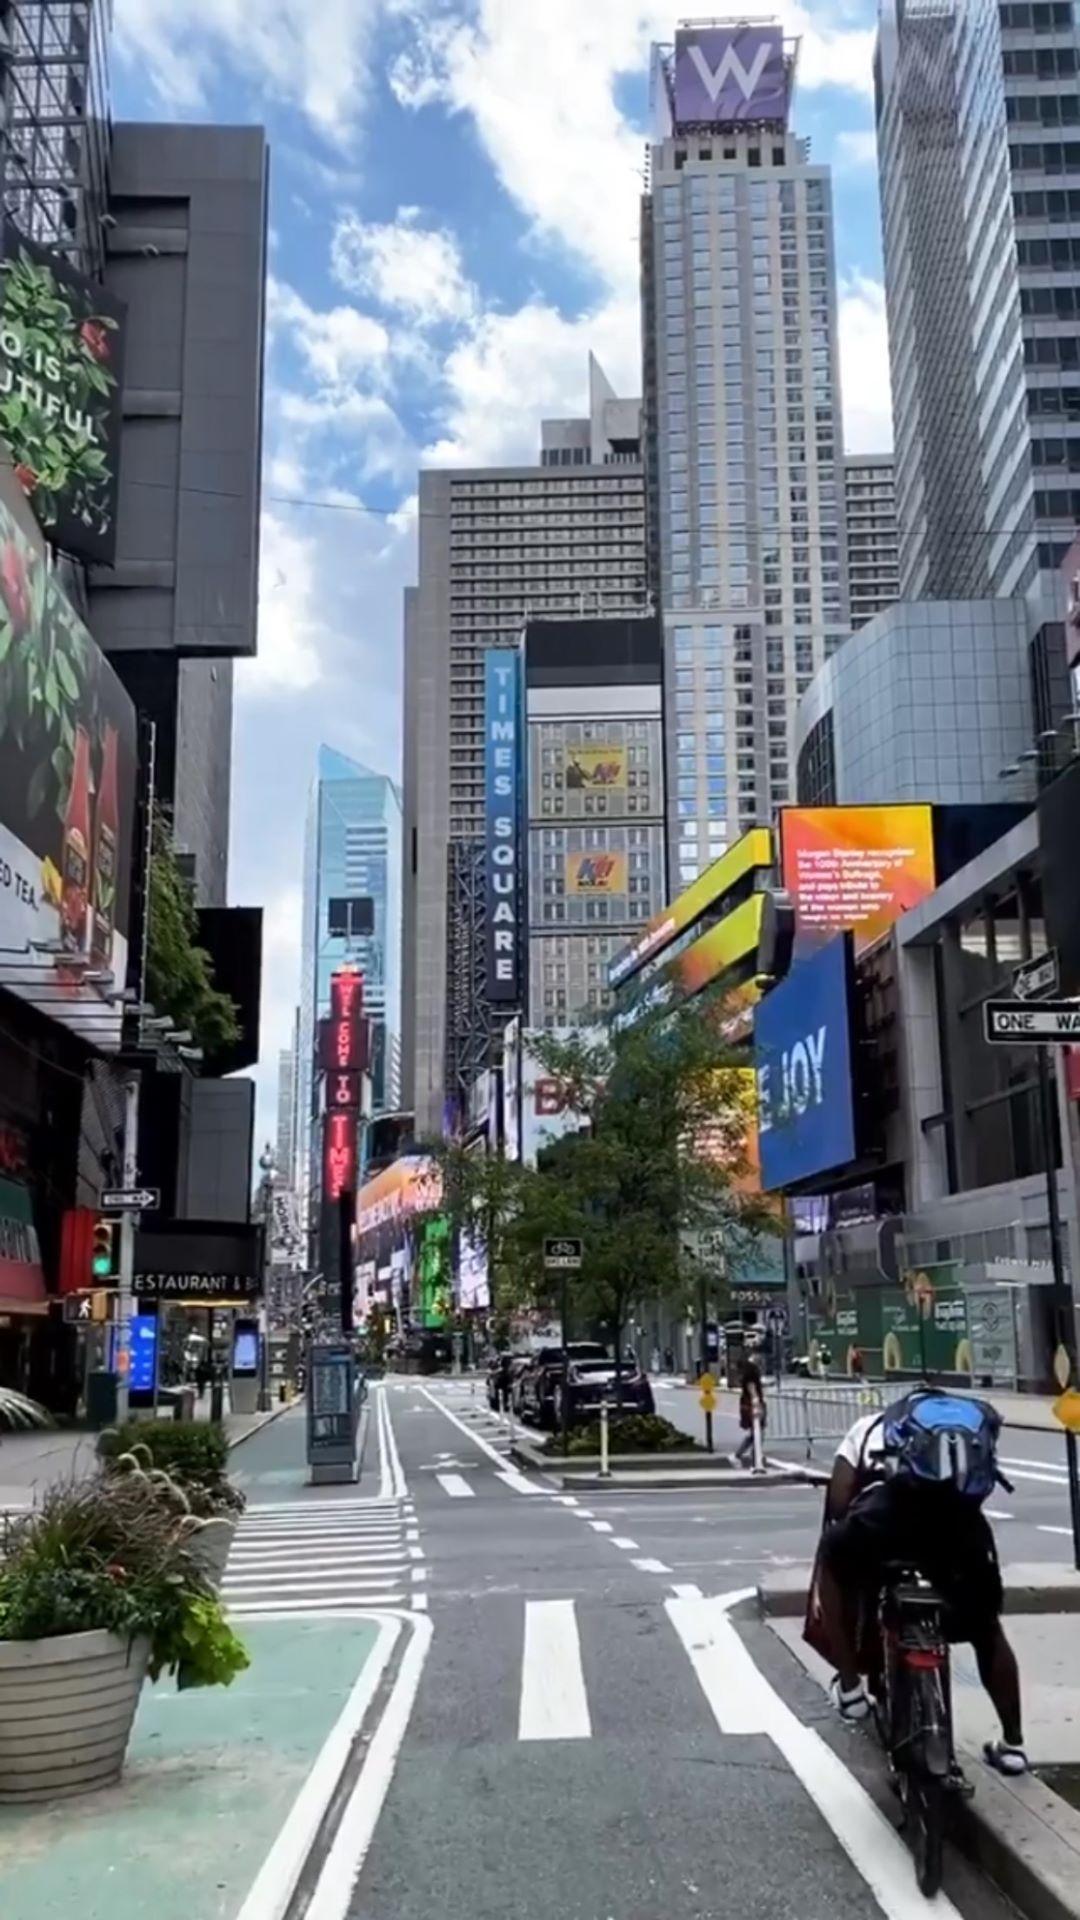 discover.n.y.c on Instagram: Biking through Times Square ✨ 🎥@nyclive #timessquare #nyc #newyork #newyorkcity #manhattan #newyorknewyork #nycphotography #newyorker…